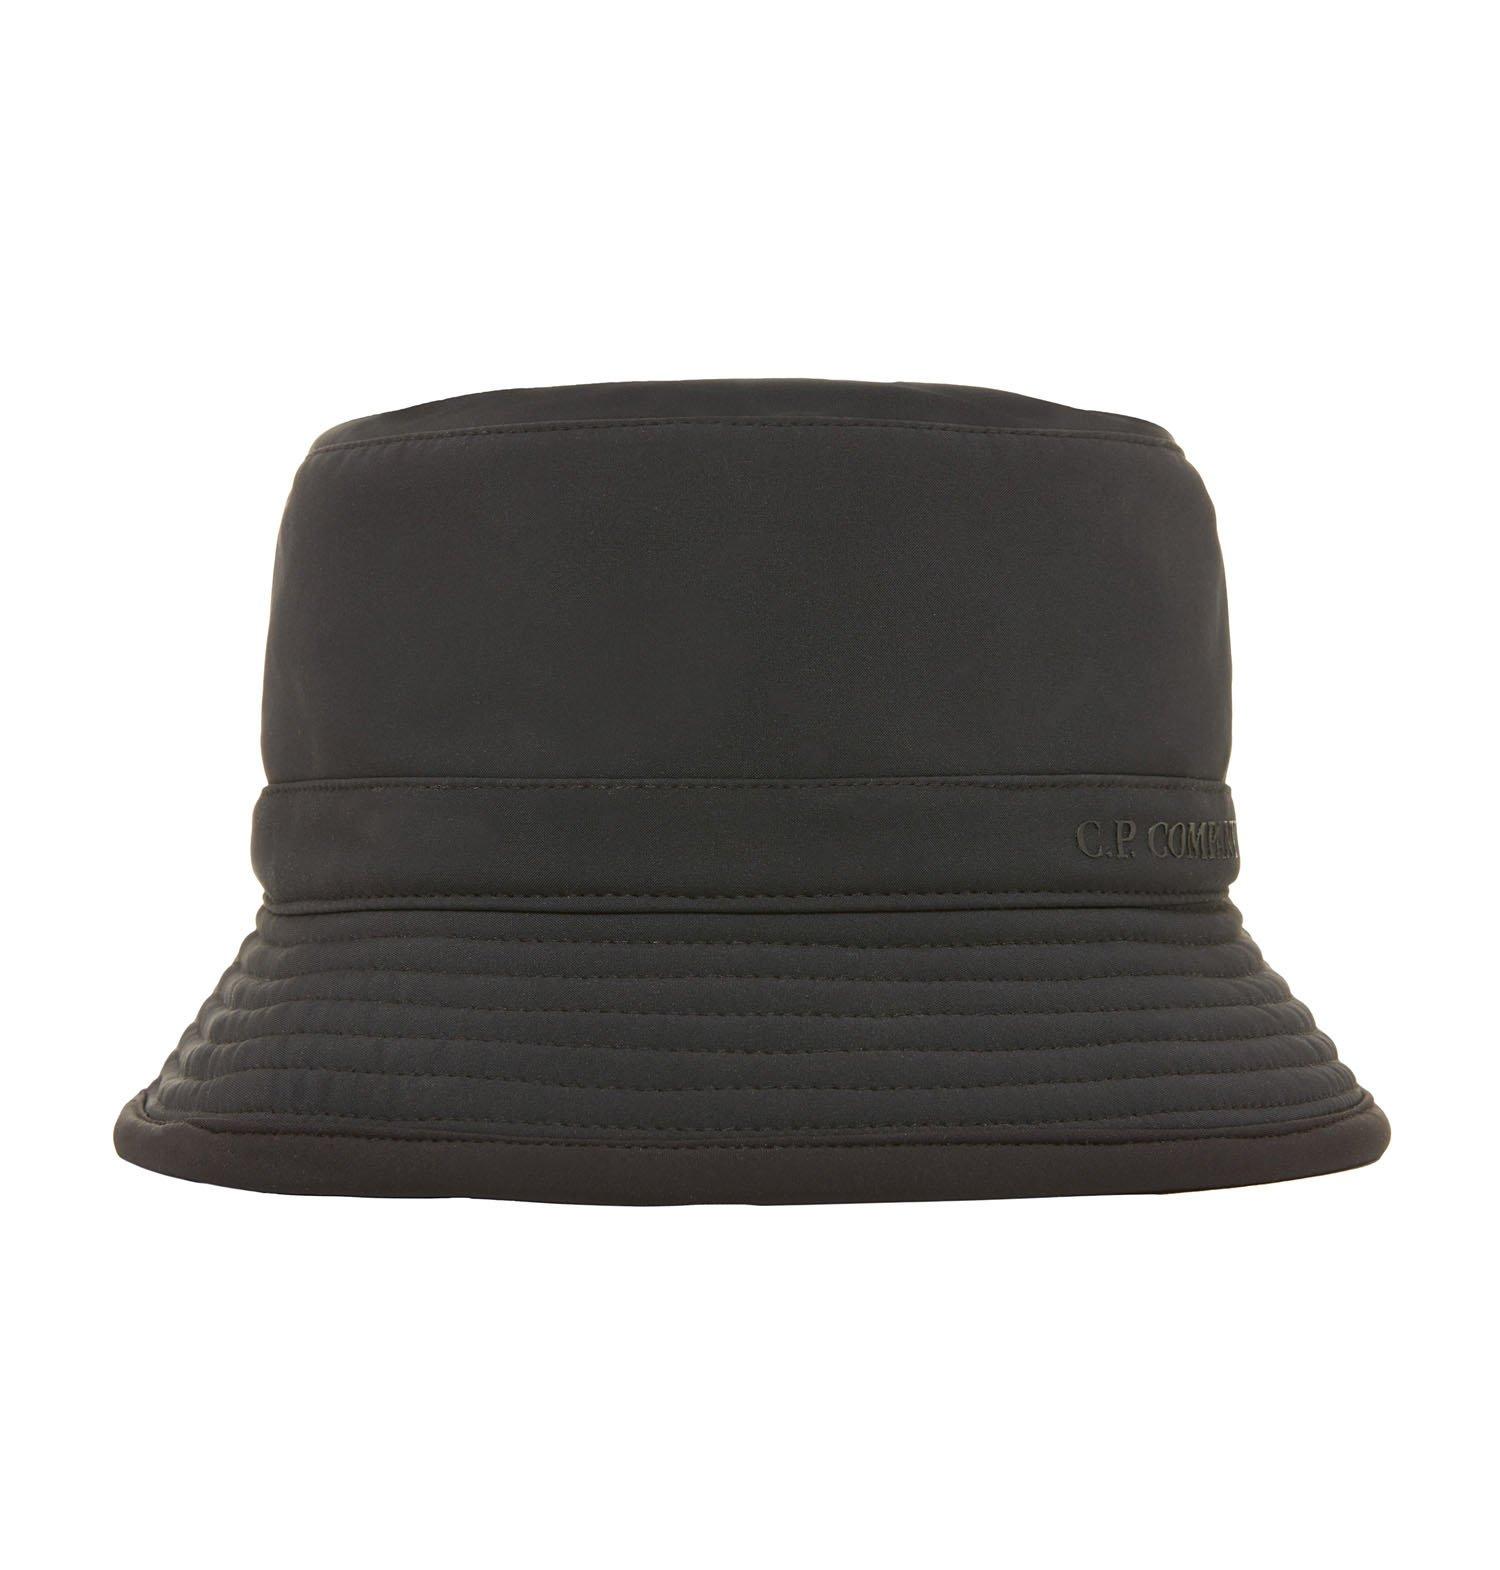 24b290098d2 C.p. Soft Shell Bucket Hat